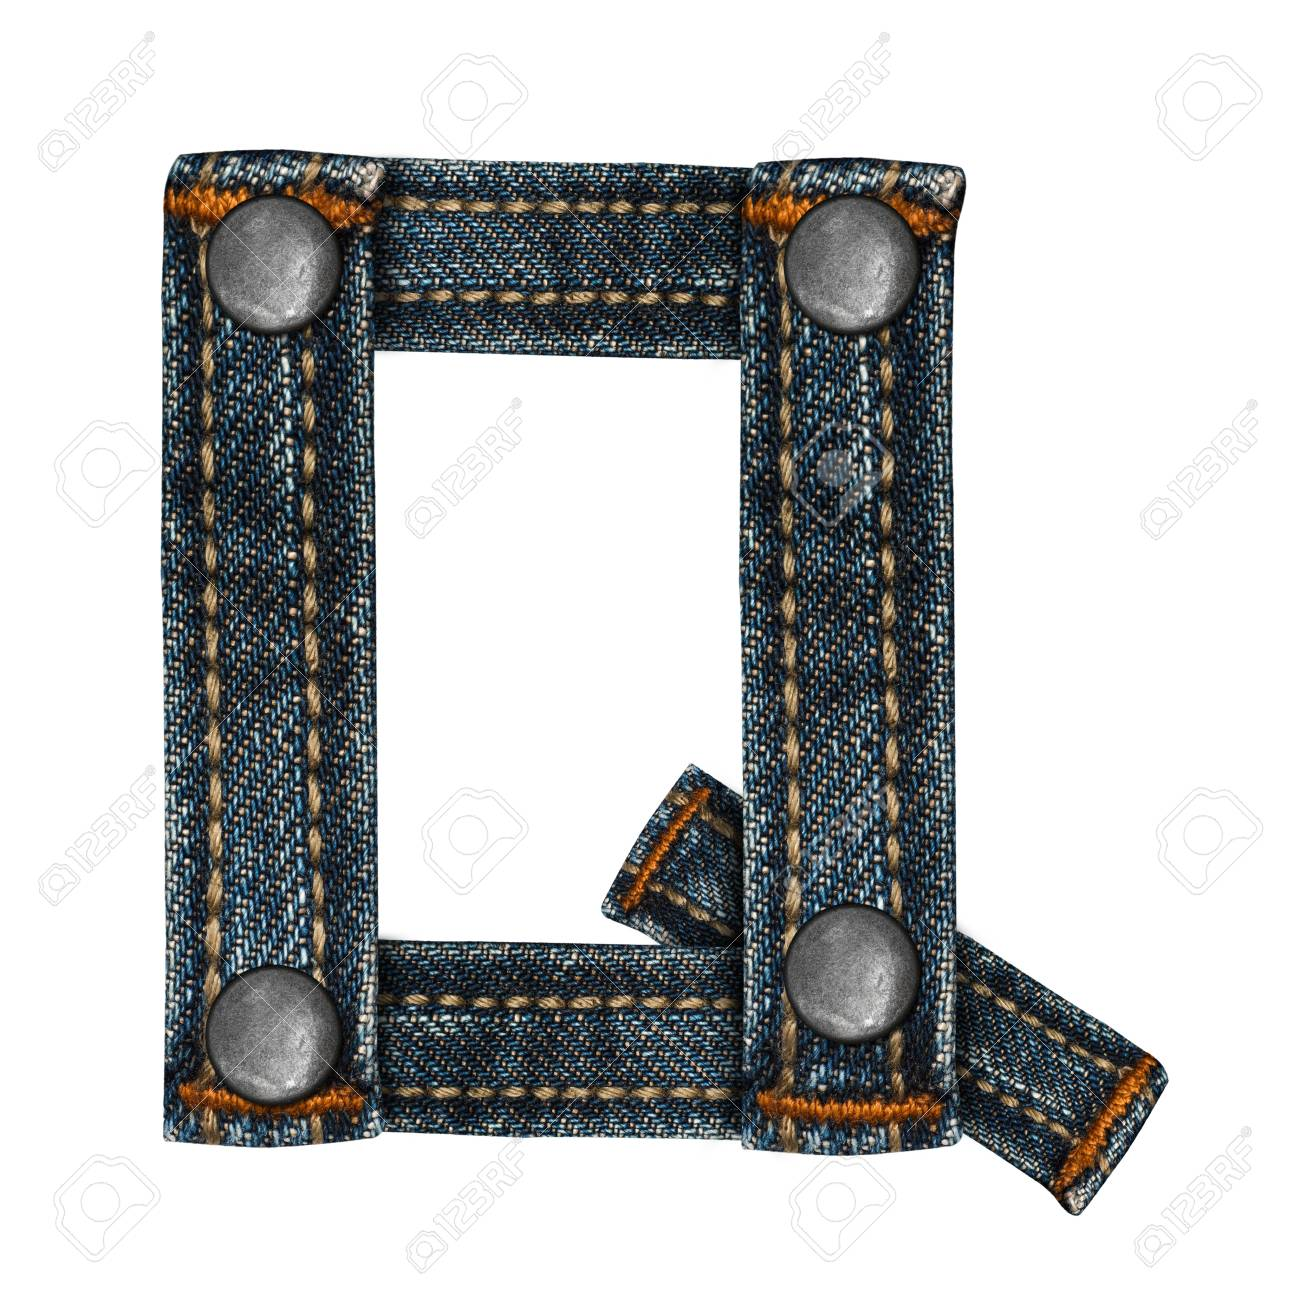 letter of jeans alphabet Stock Photo - 14150431